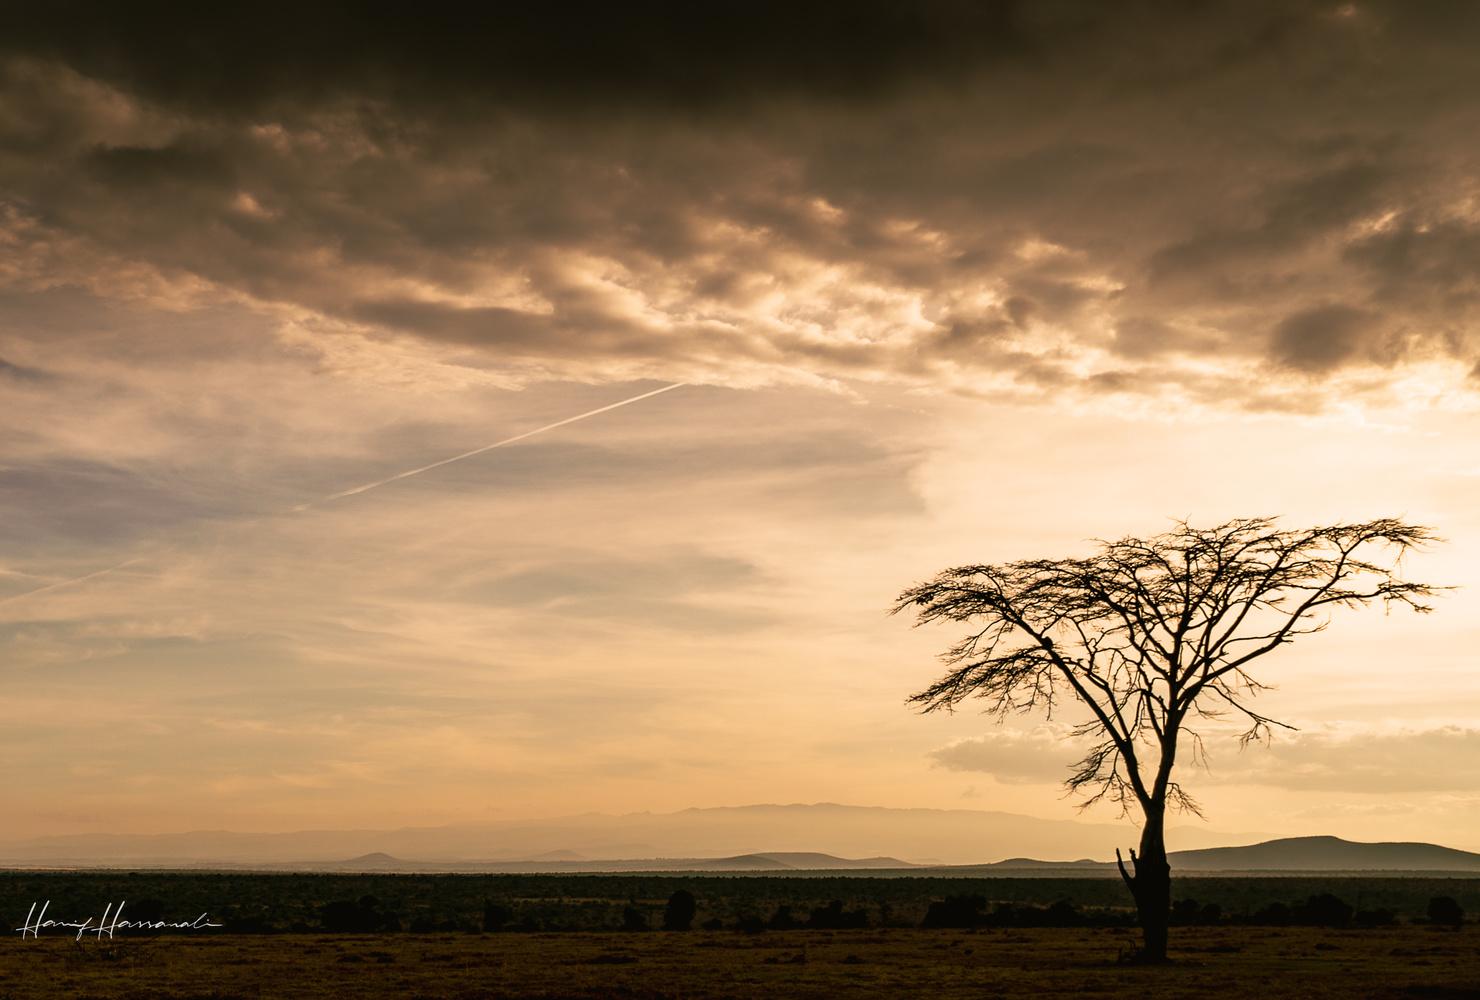 Ol Pejeta Sunset by Hanif H